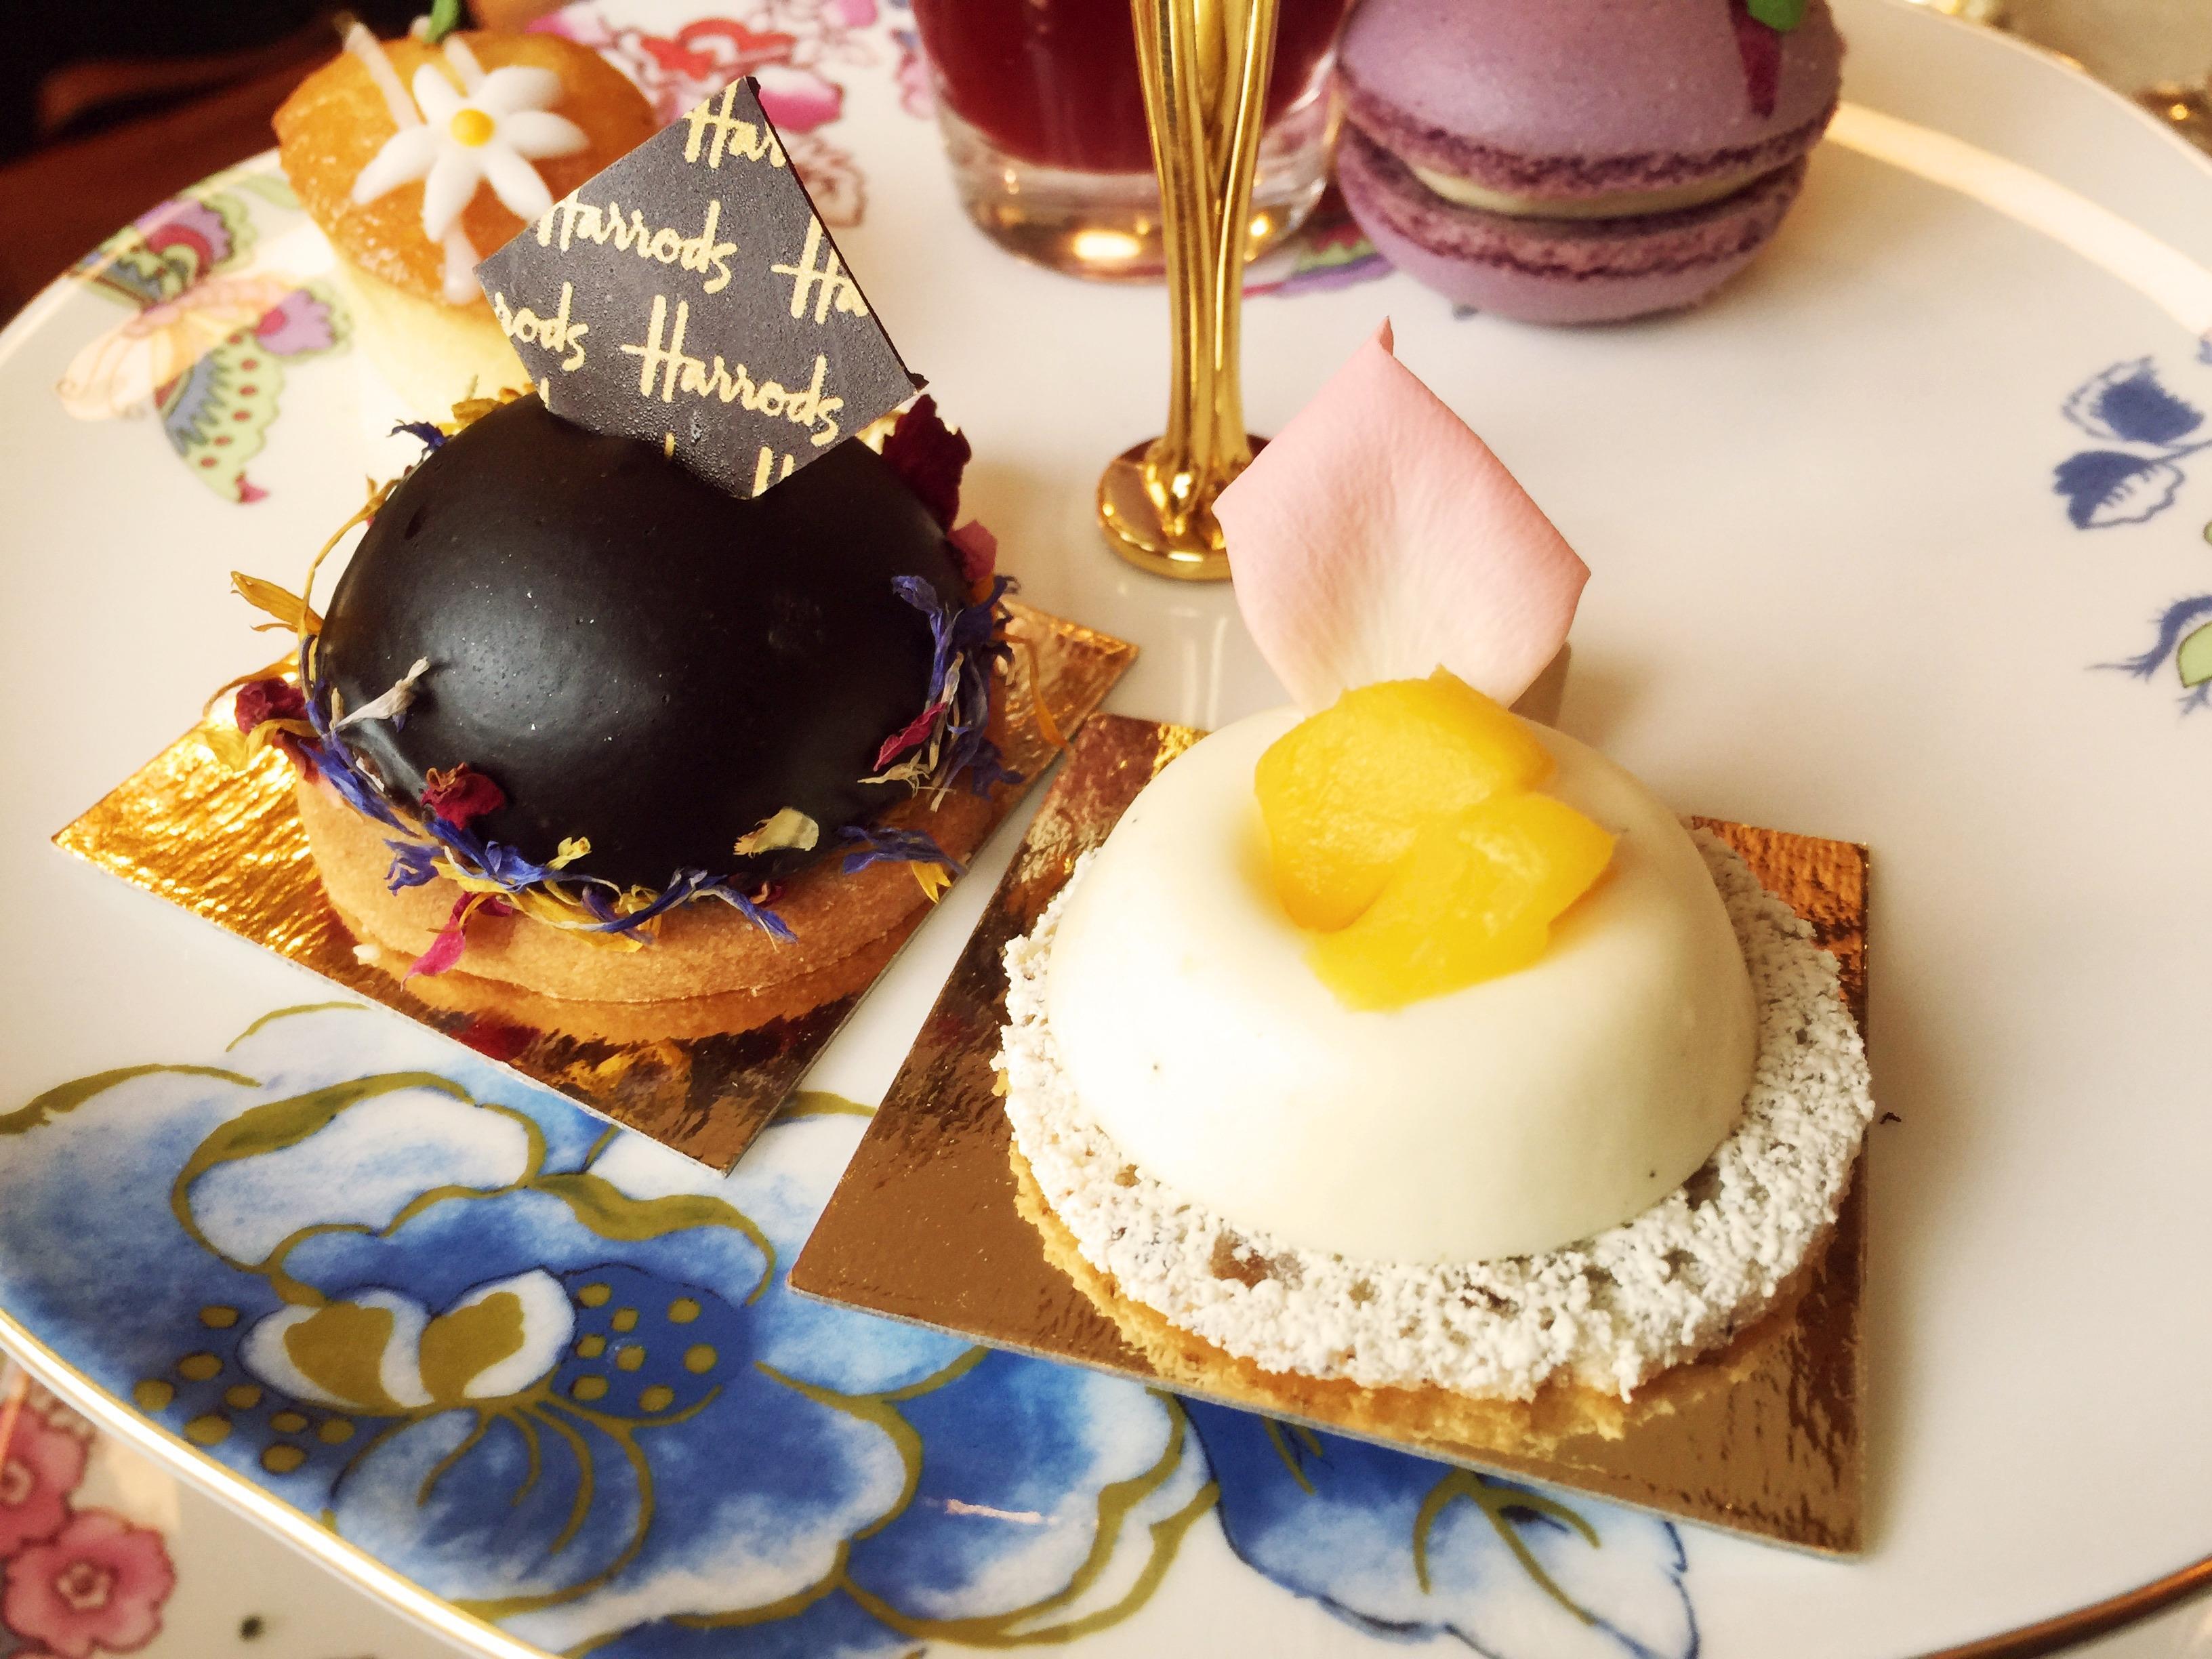 pastries-floral-afternoon-tea